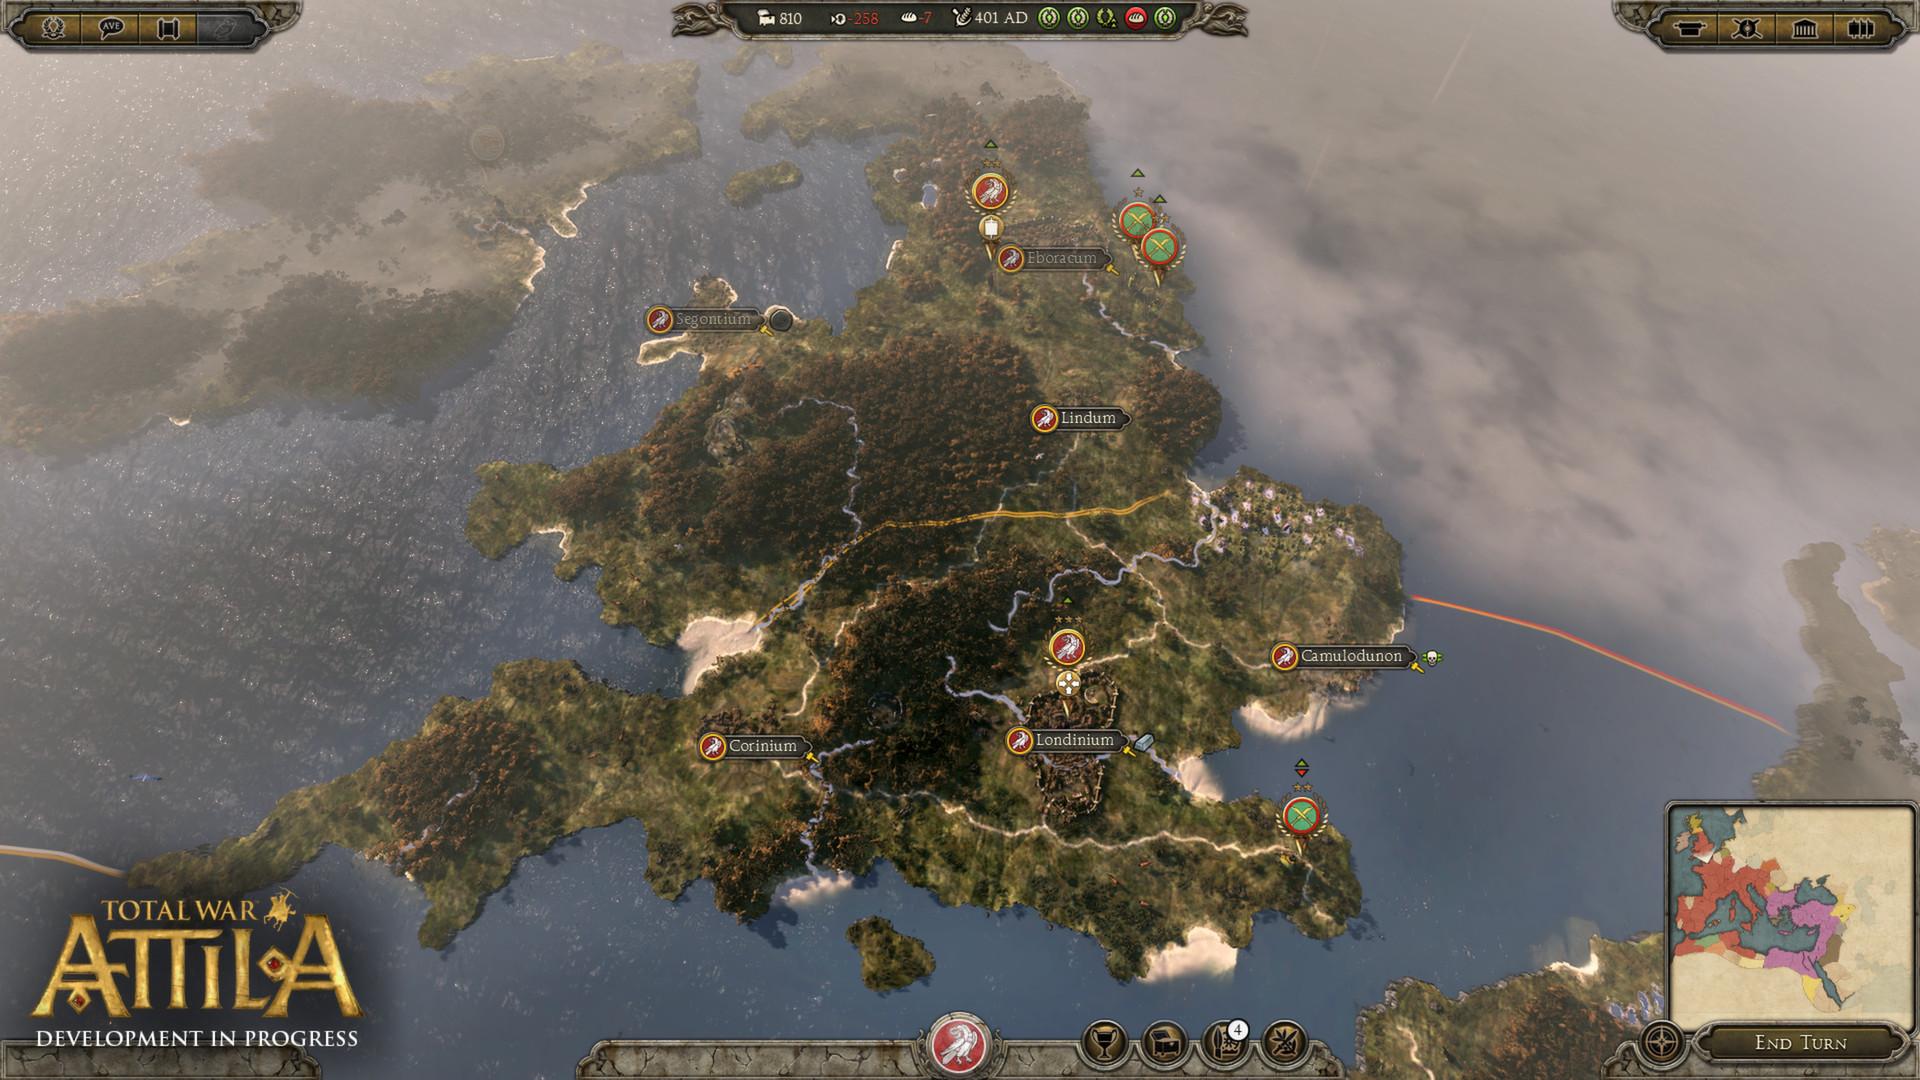 Total War Attila ESPAÑOL Full PC Incluye DLC (CPY) + REPACK 2 DVD5 (JPW) 5